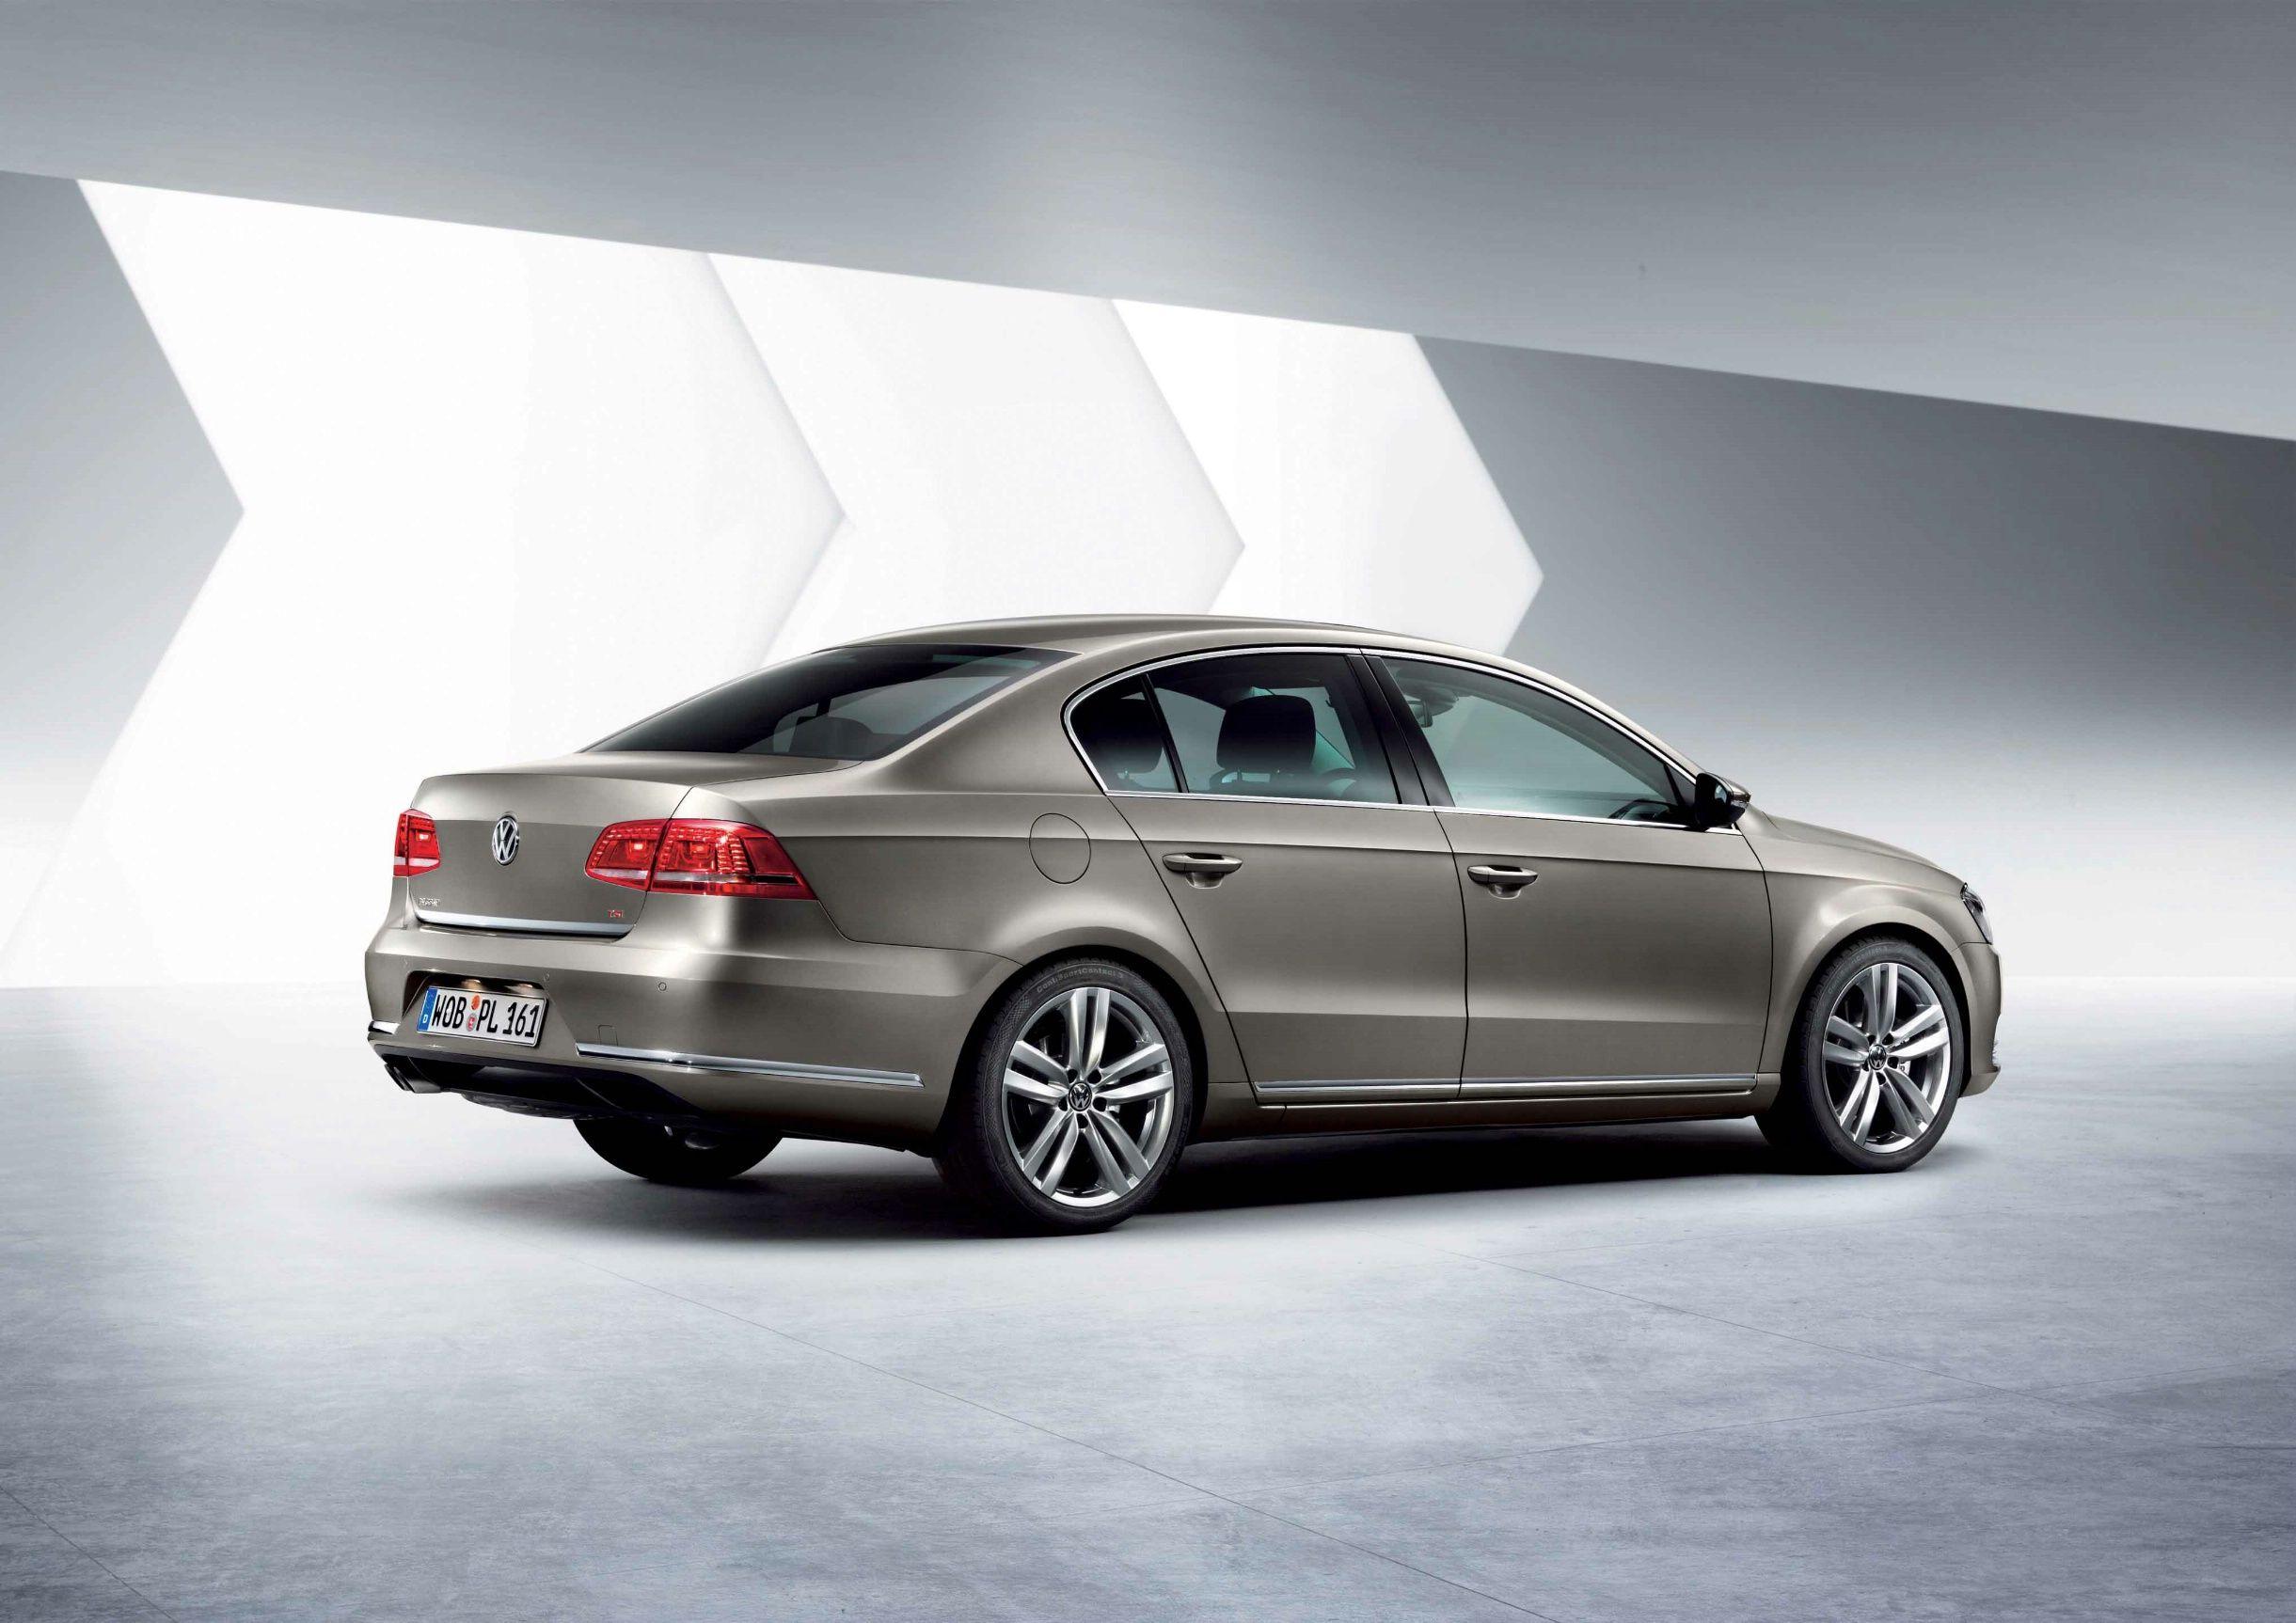 Посторонние звуки и вибрация в районе бензобака VW Passat B7